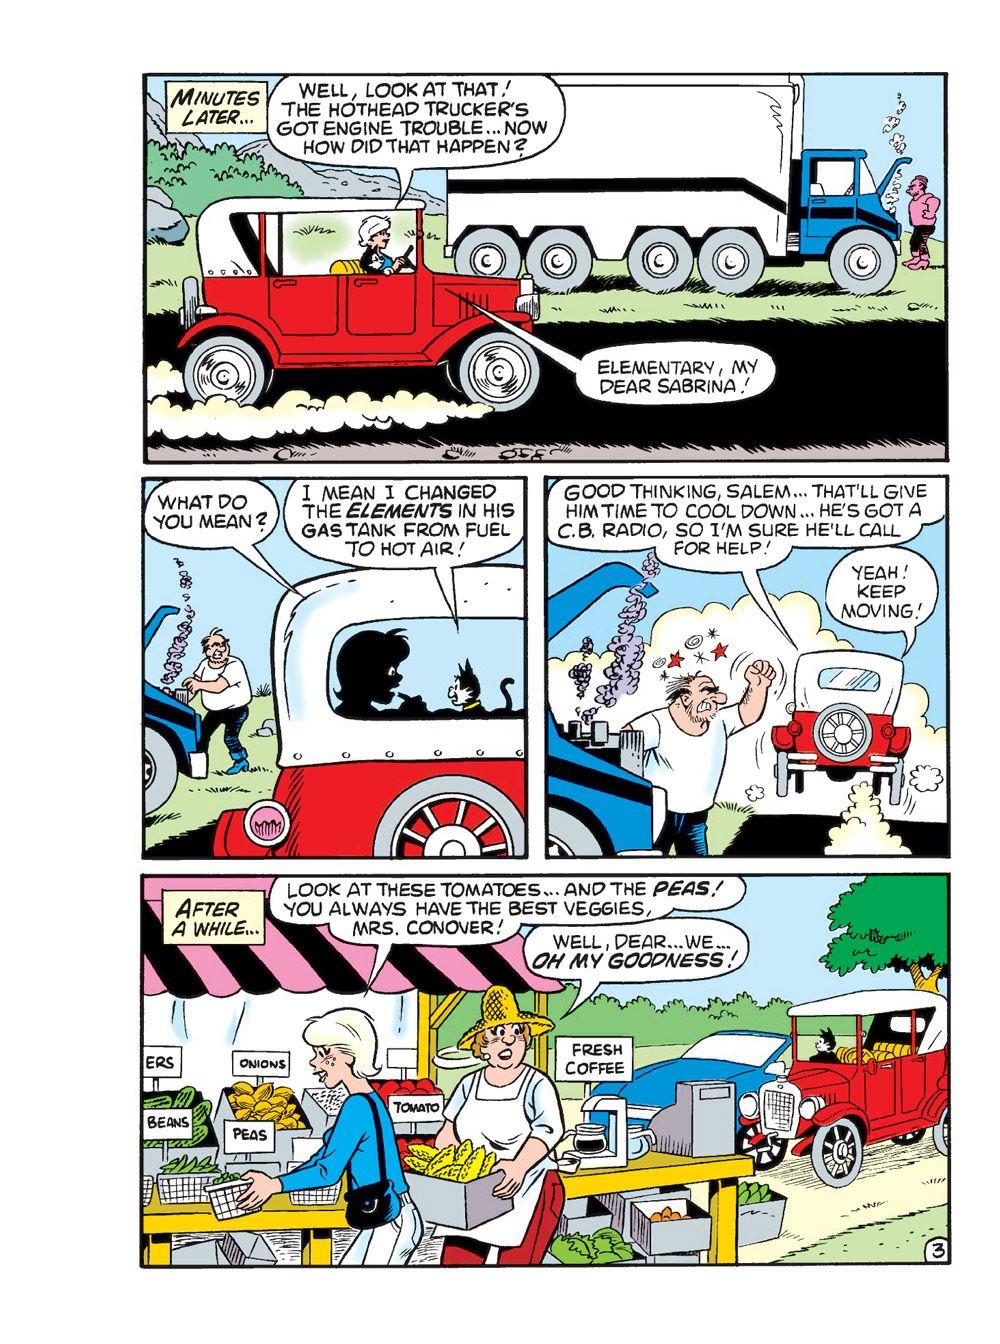 BettyAndVeronicaJumboComicsDigest_293-49 ComicList Previews: BETTY AND VERONICA JUMBO COMICS DIGEST #293